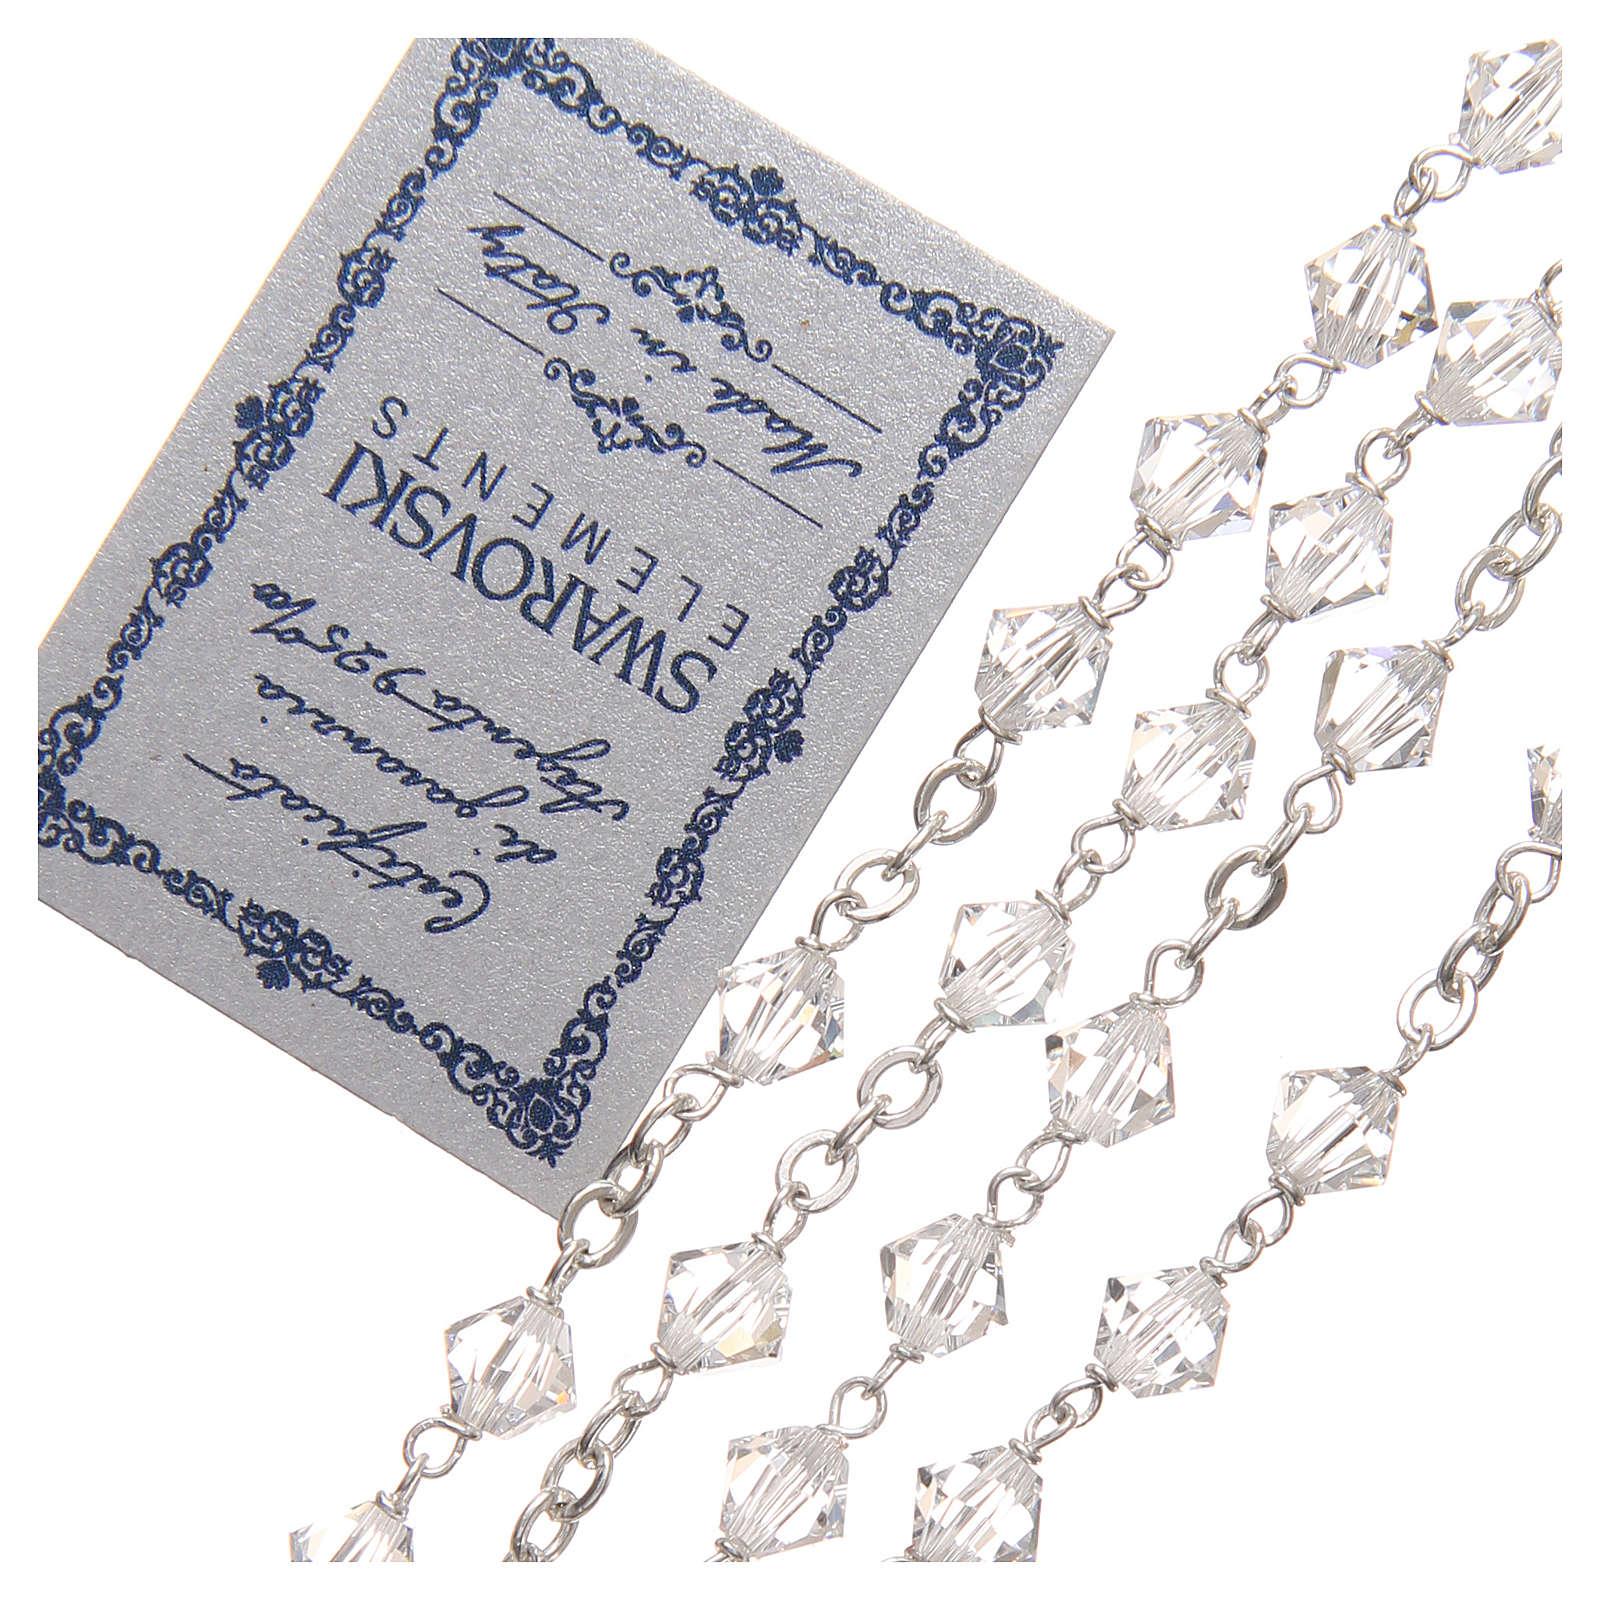 Chapelet argent 925 Swarovski chaîne mailles rondes 6 mm cristal 4